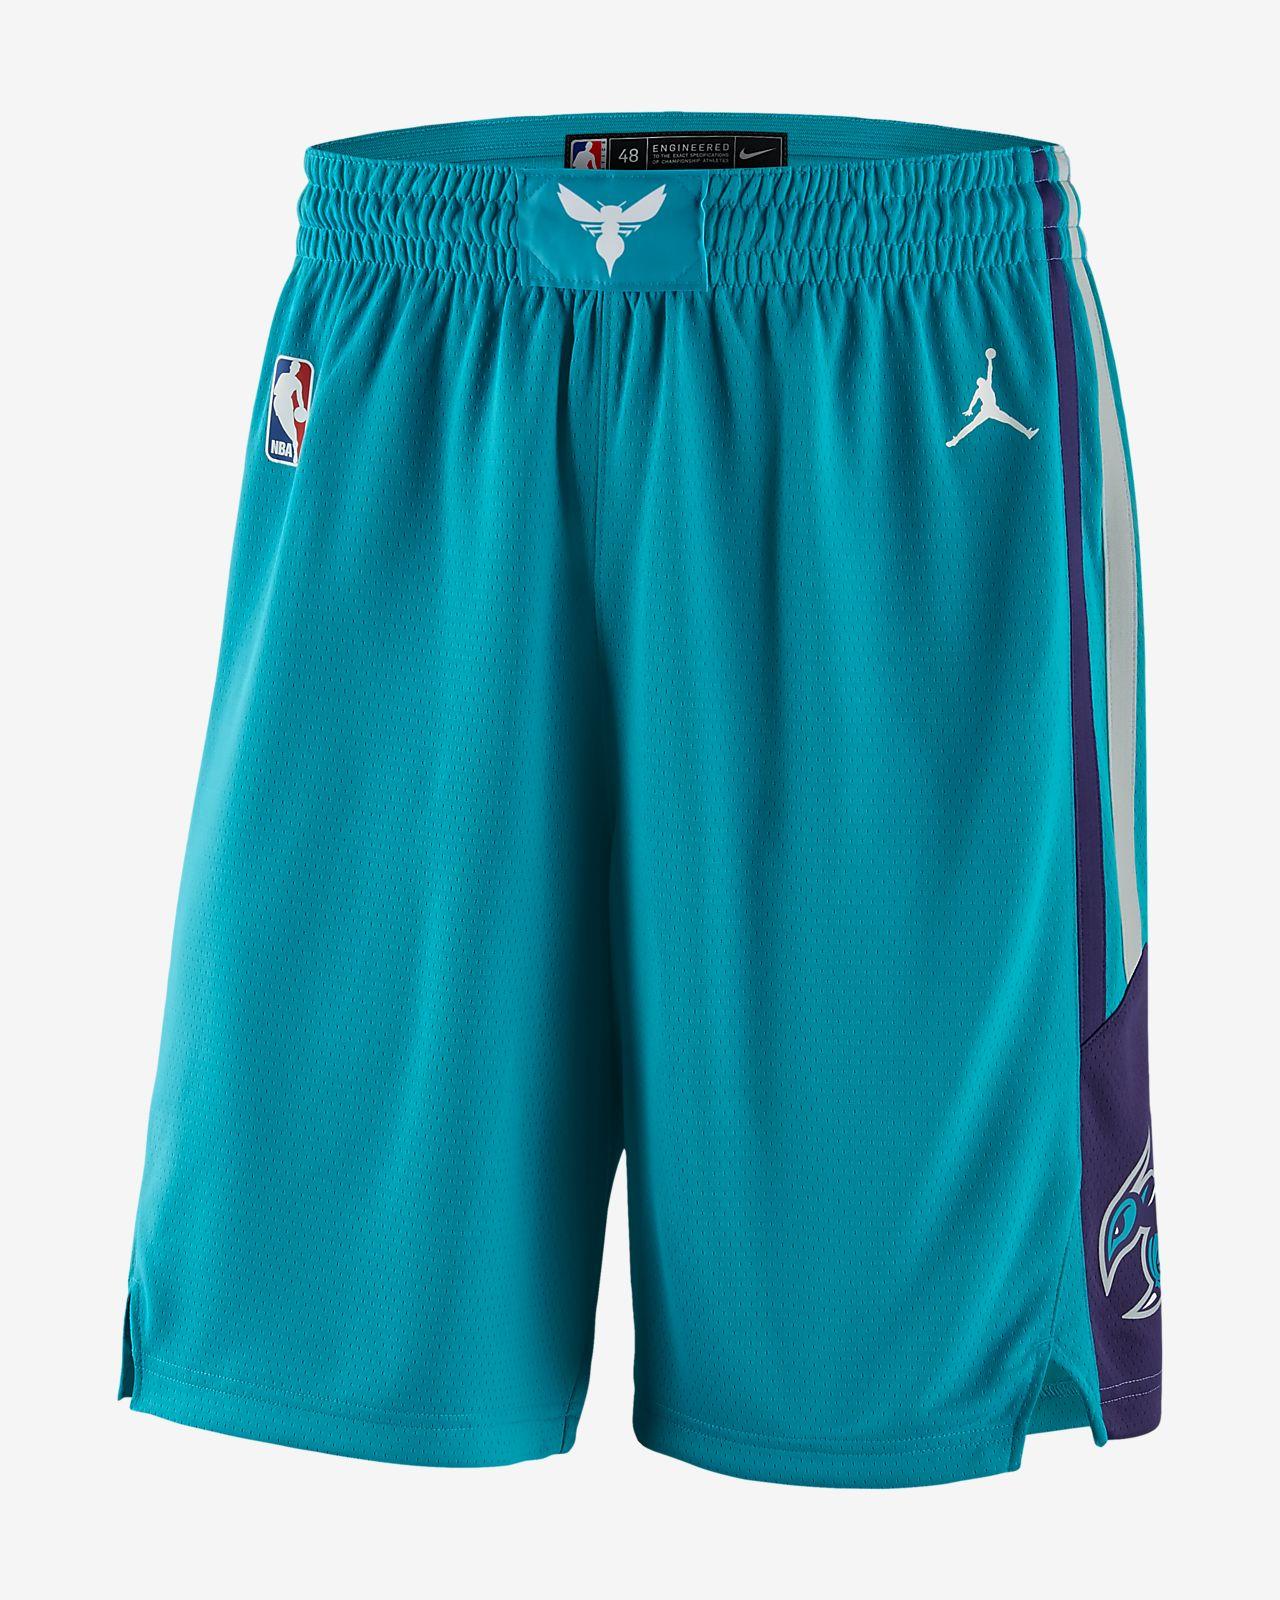 Charlotte Hornets Icon Edition Swingman Pantalón corto Jordan de la NBA -  Hombre bfcb6d1b900e3